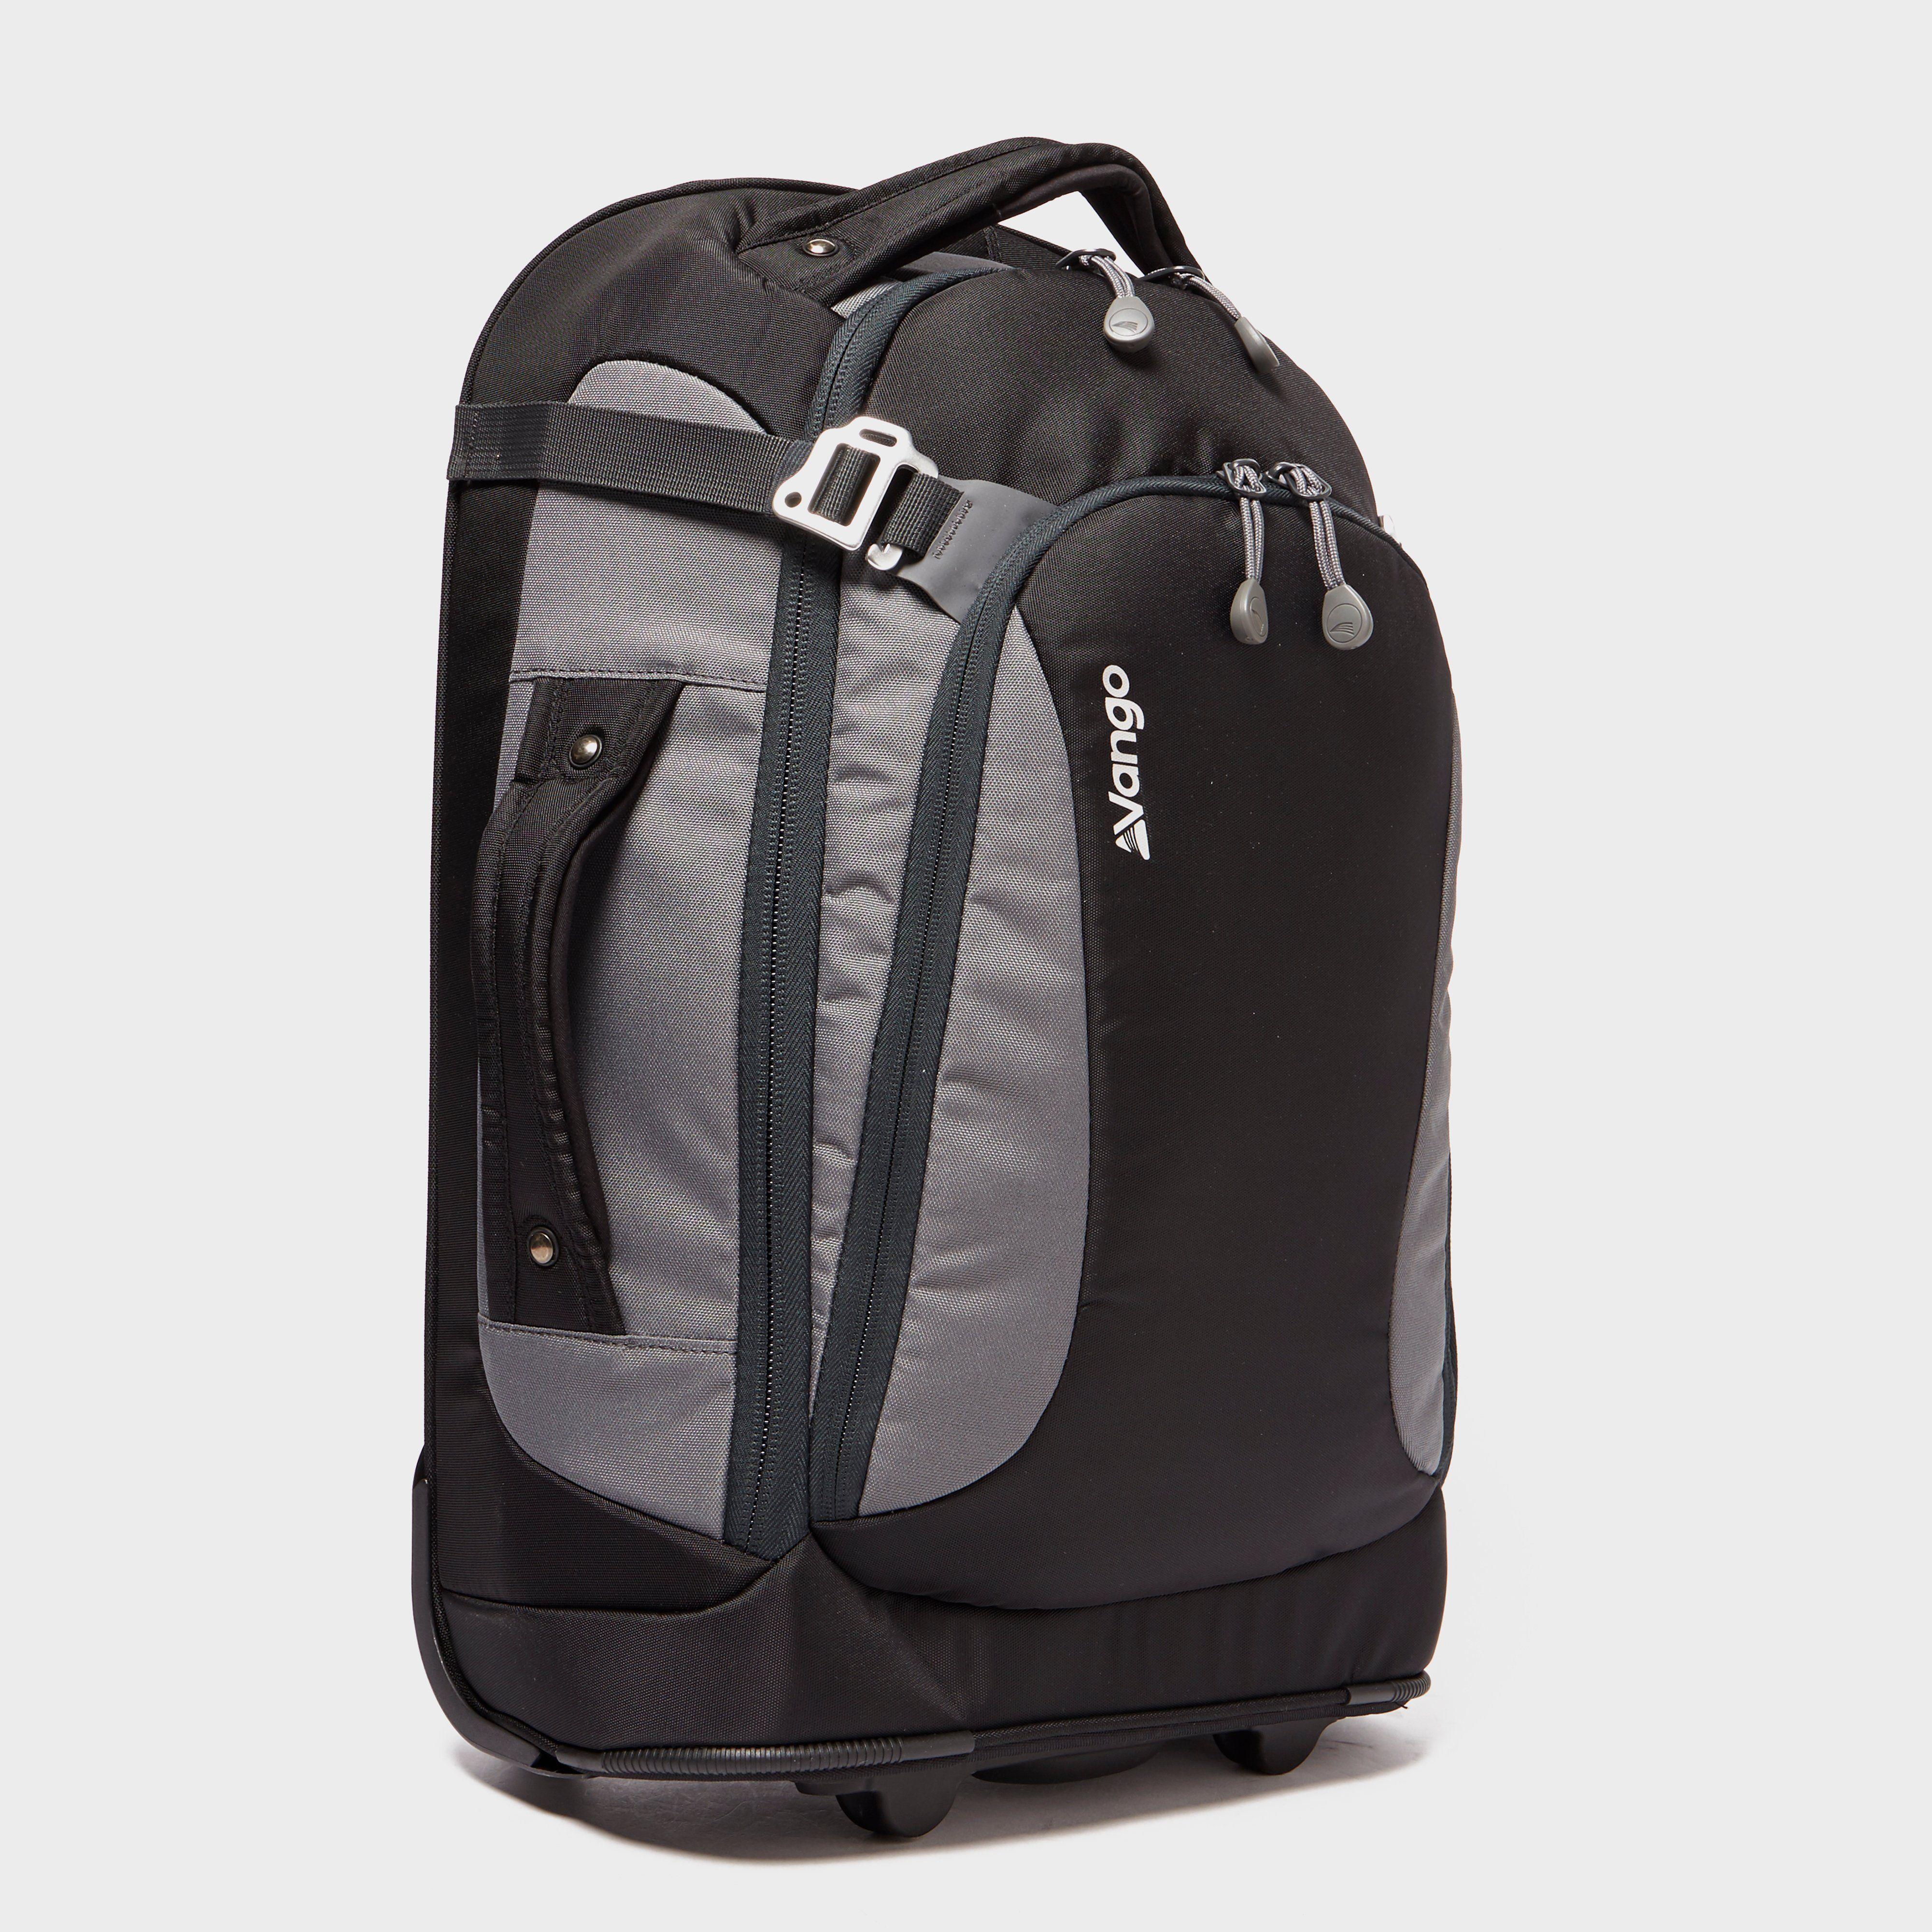 VANGO Escape 40L Wheeled Travel Pack